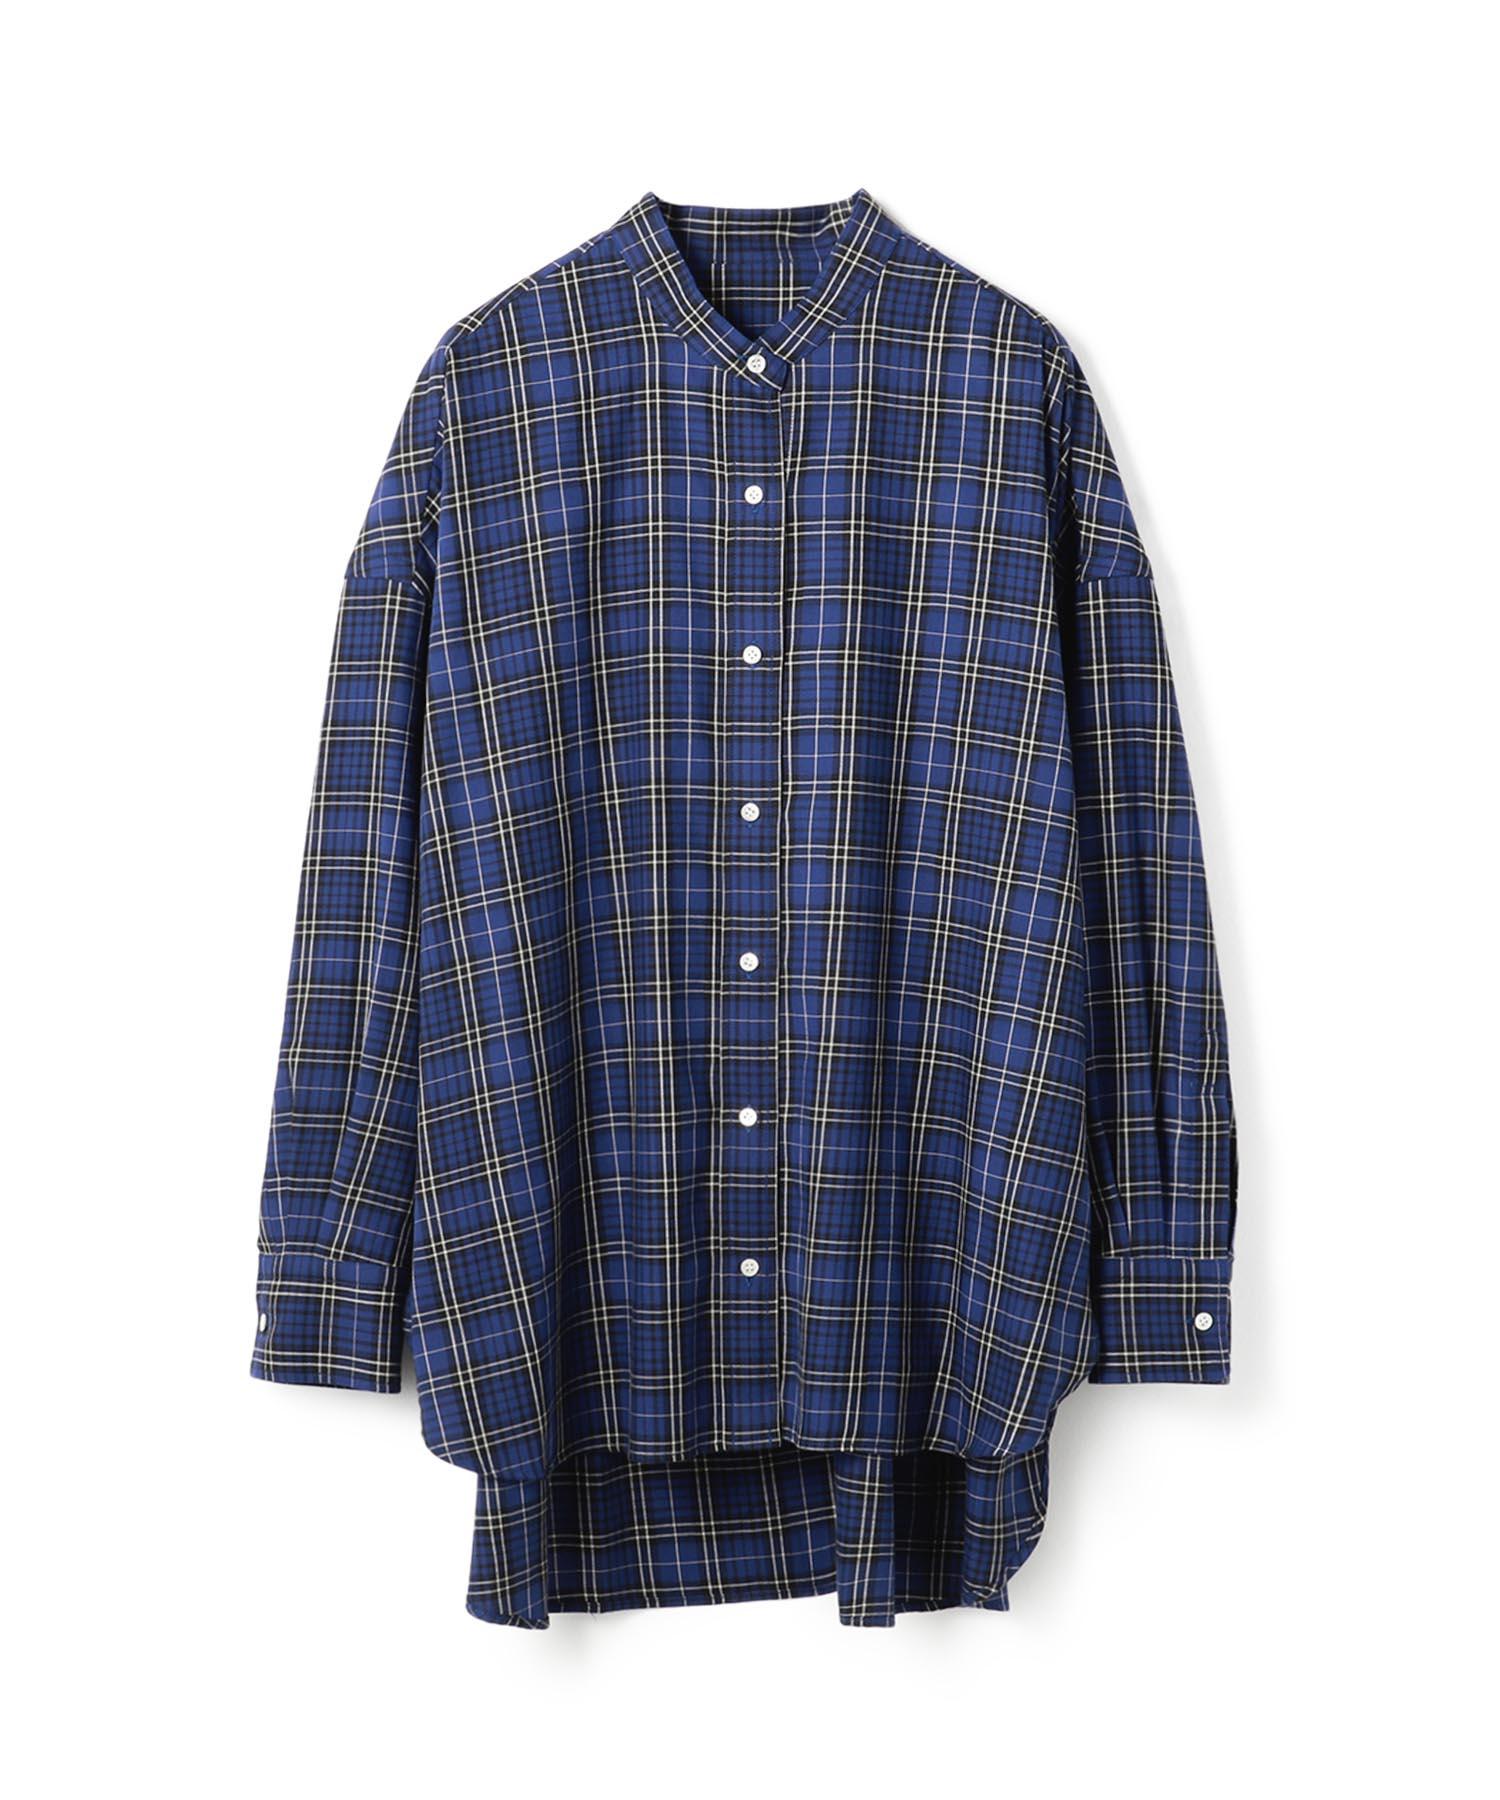 【VERY 11月号 掲載商品】ESTNATION チェック柄ビックシャツ